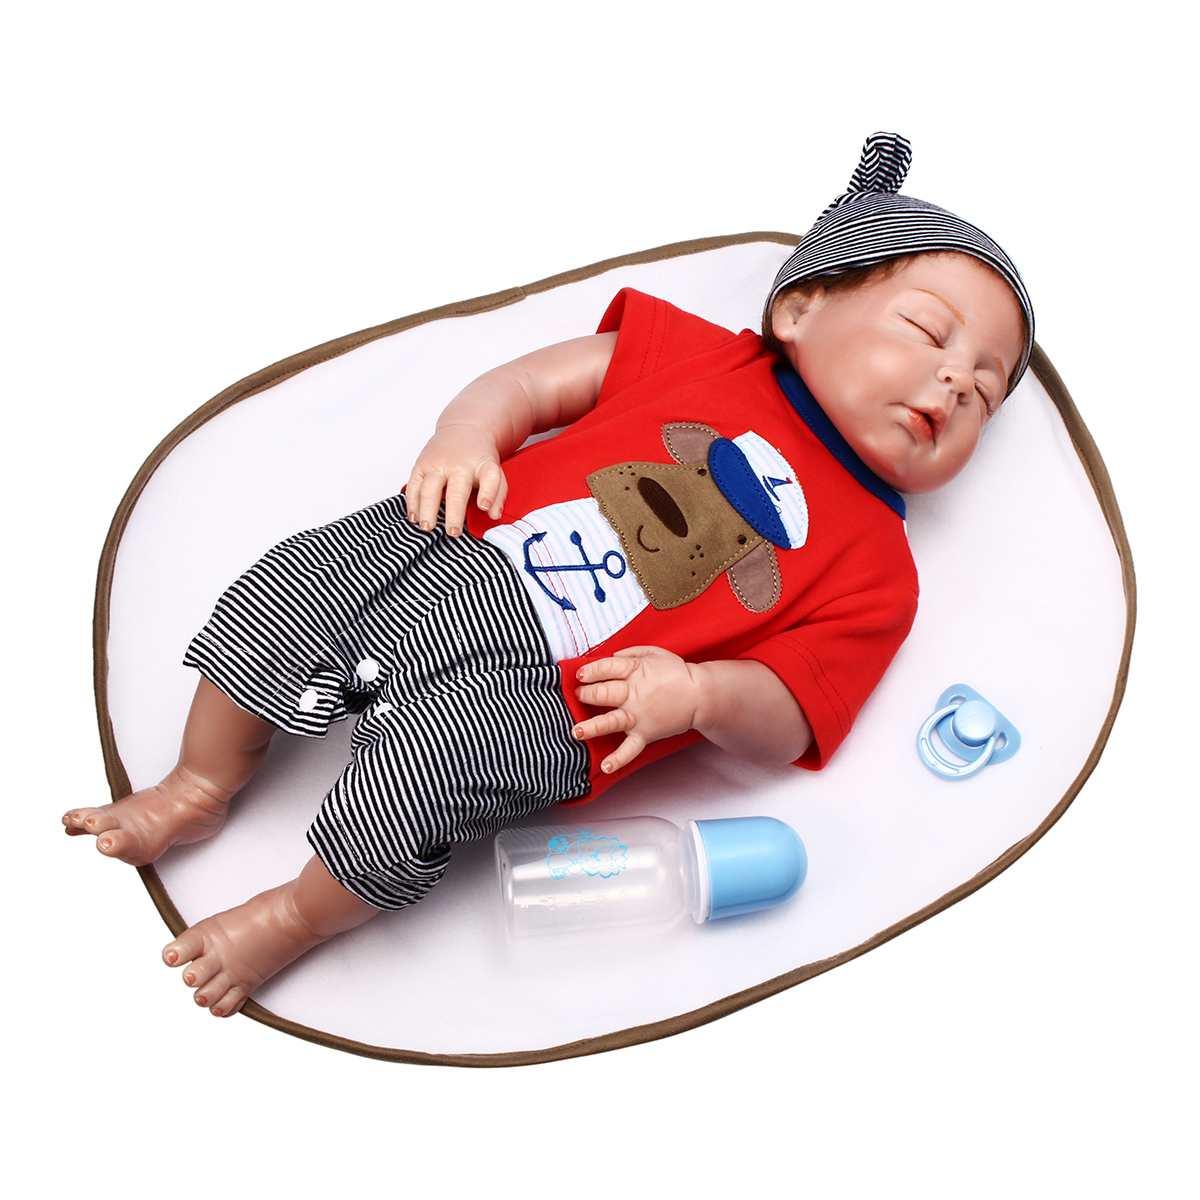 Newborn Boy Doll 23 58cm Reborn Sleeping Baby Silicone Vinyl Lifelike Realistic Adorable Toddler Infant Doll Accessories ToysNewborn Boy Doll 23 58cm Reborn Sleeping Baby Silicone Vinyl Lifelike Realistic Adorable Toddler Infant Doll Accessories Toys